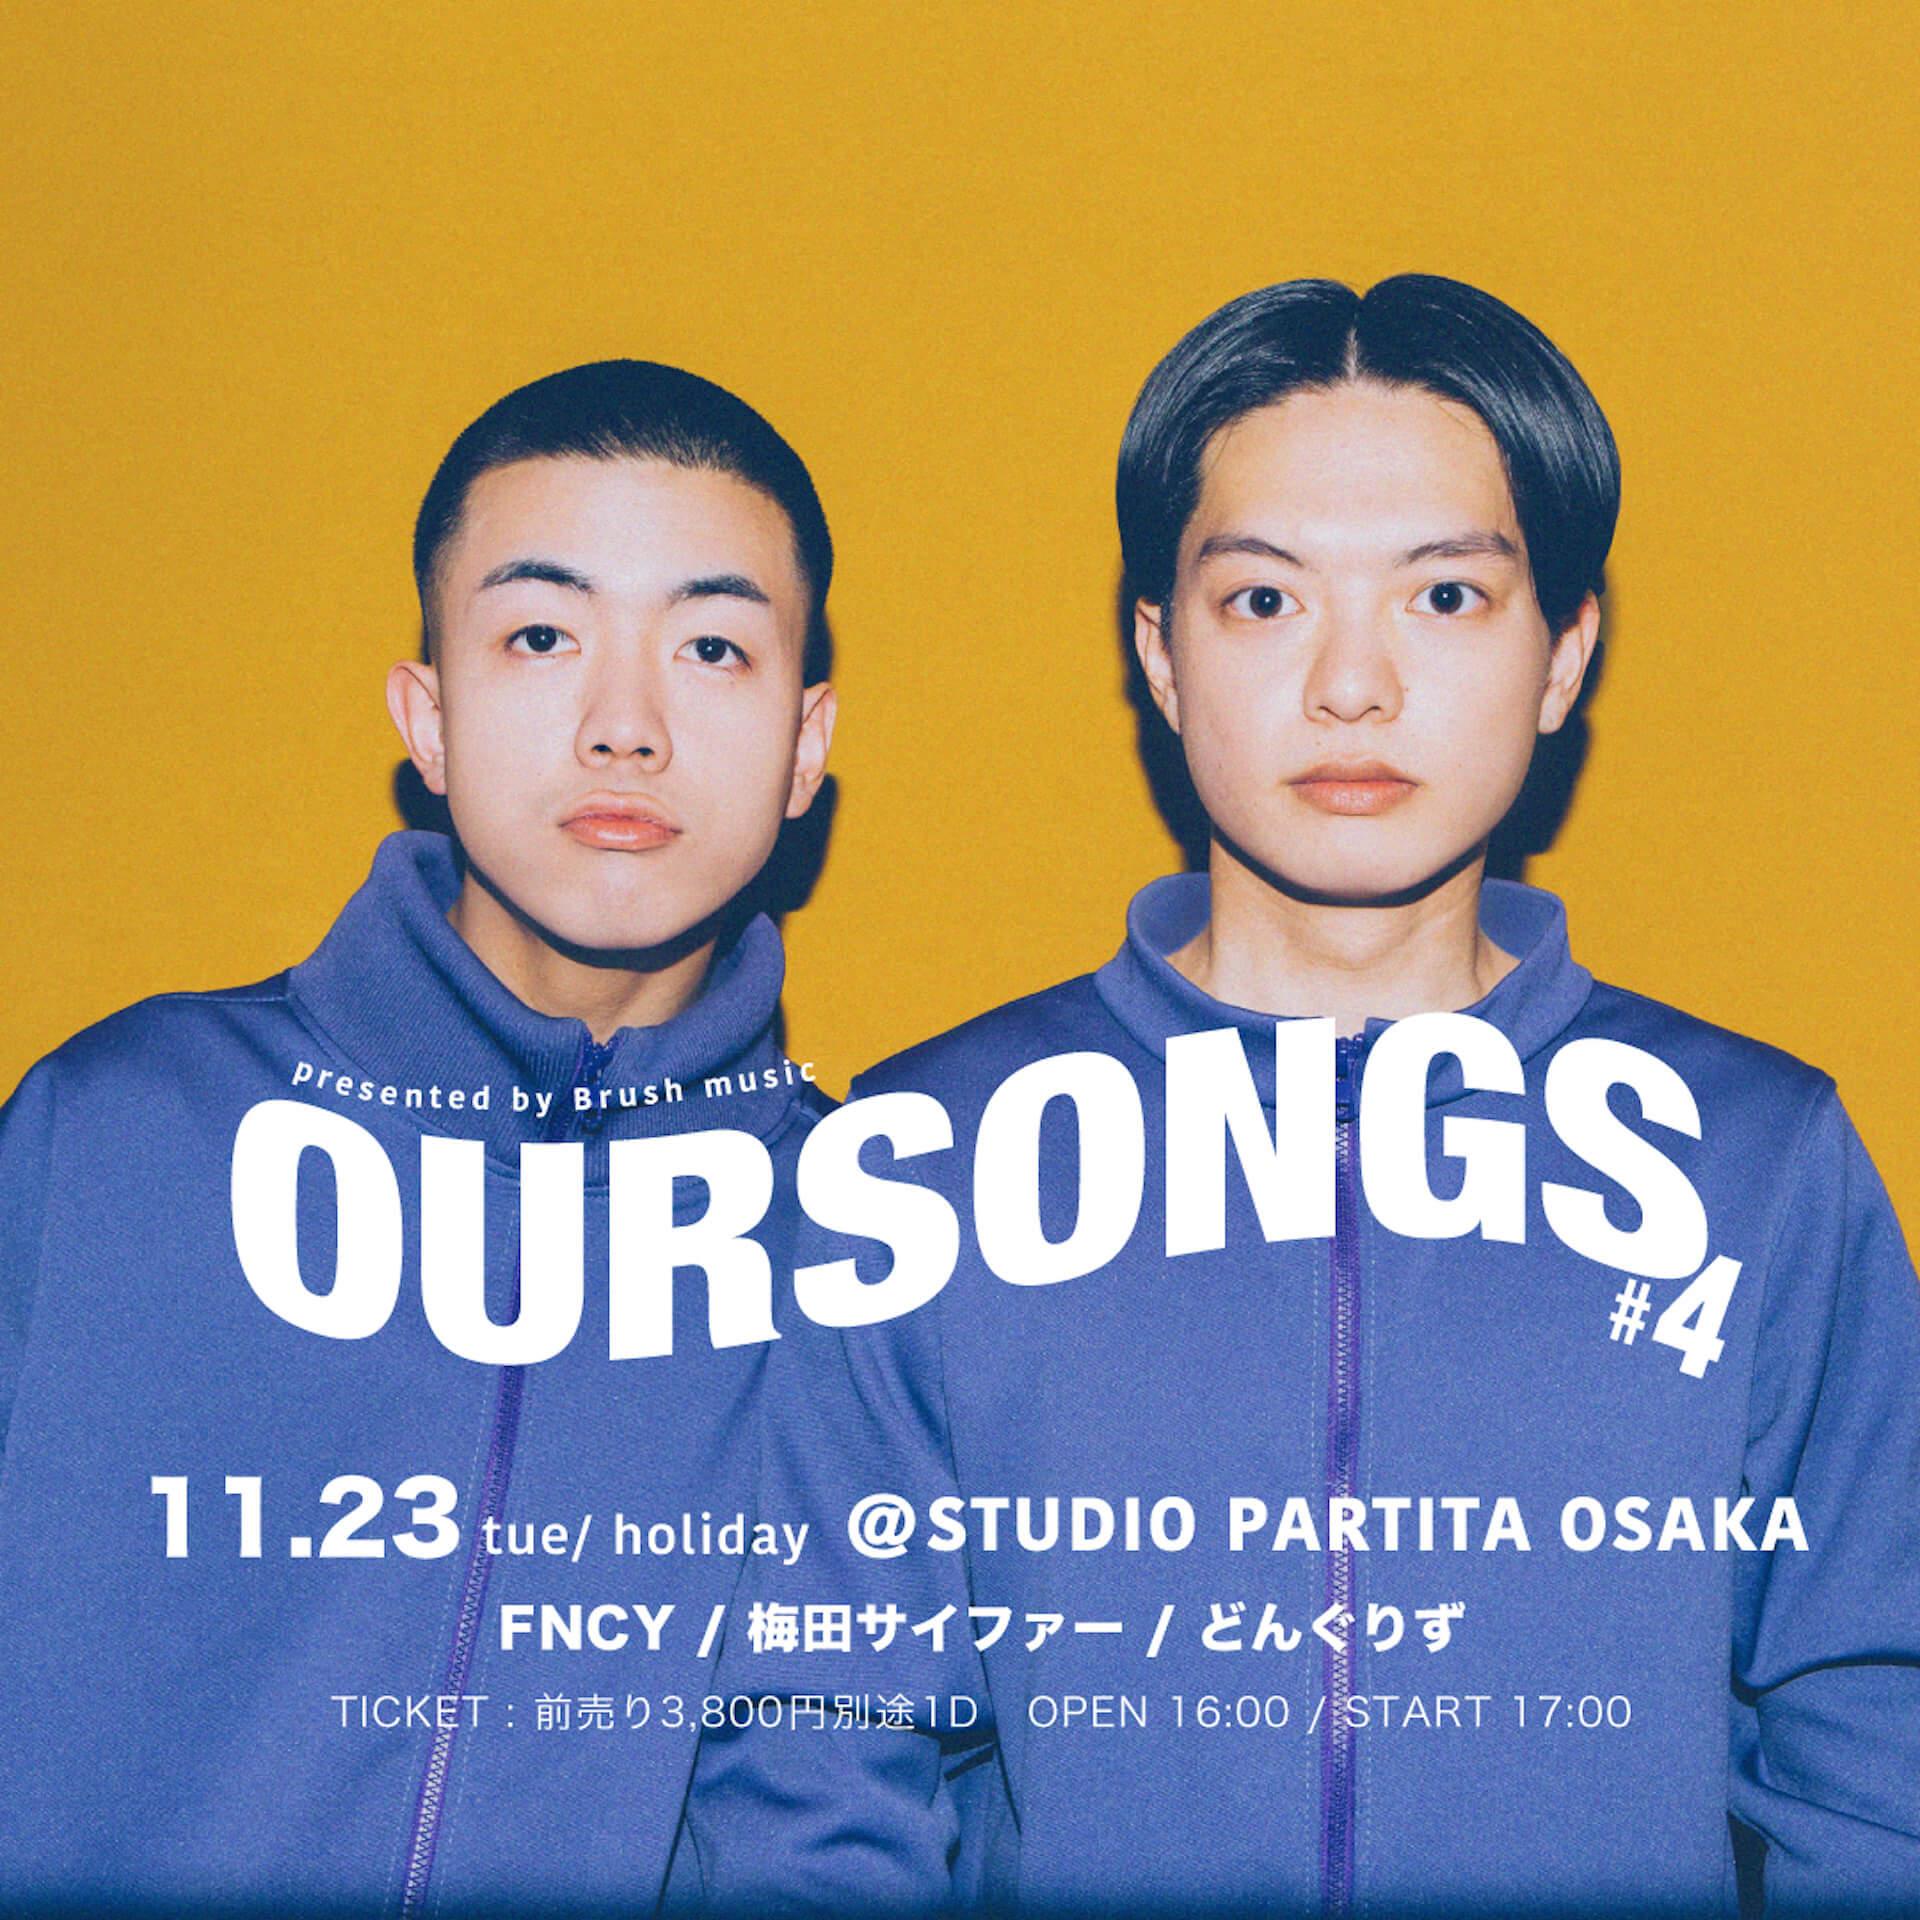 <OURSONGS #4>が大阪名村造船所跡地にて開催が決定!梅田サイファー、FNCY、どんぐりずによるスリーマン music211012_oursongs_03